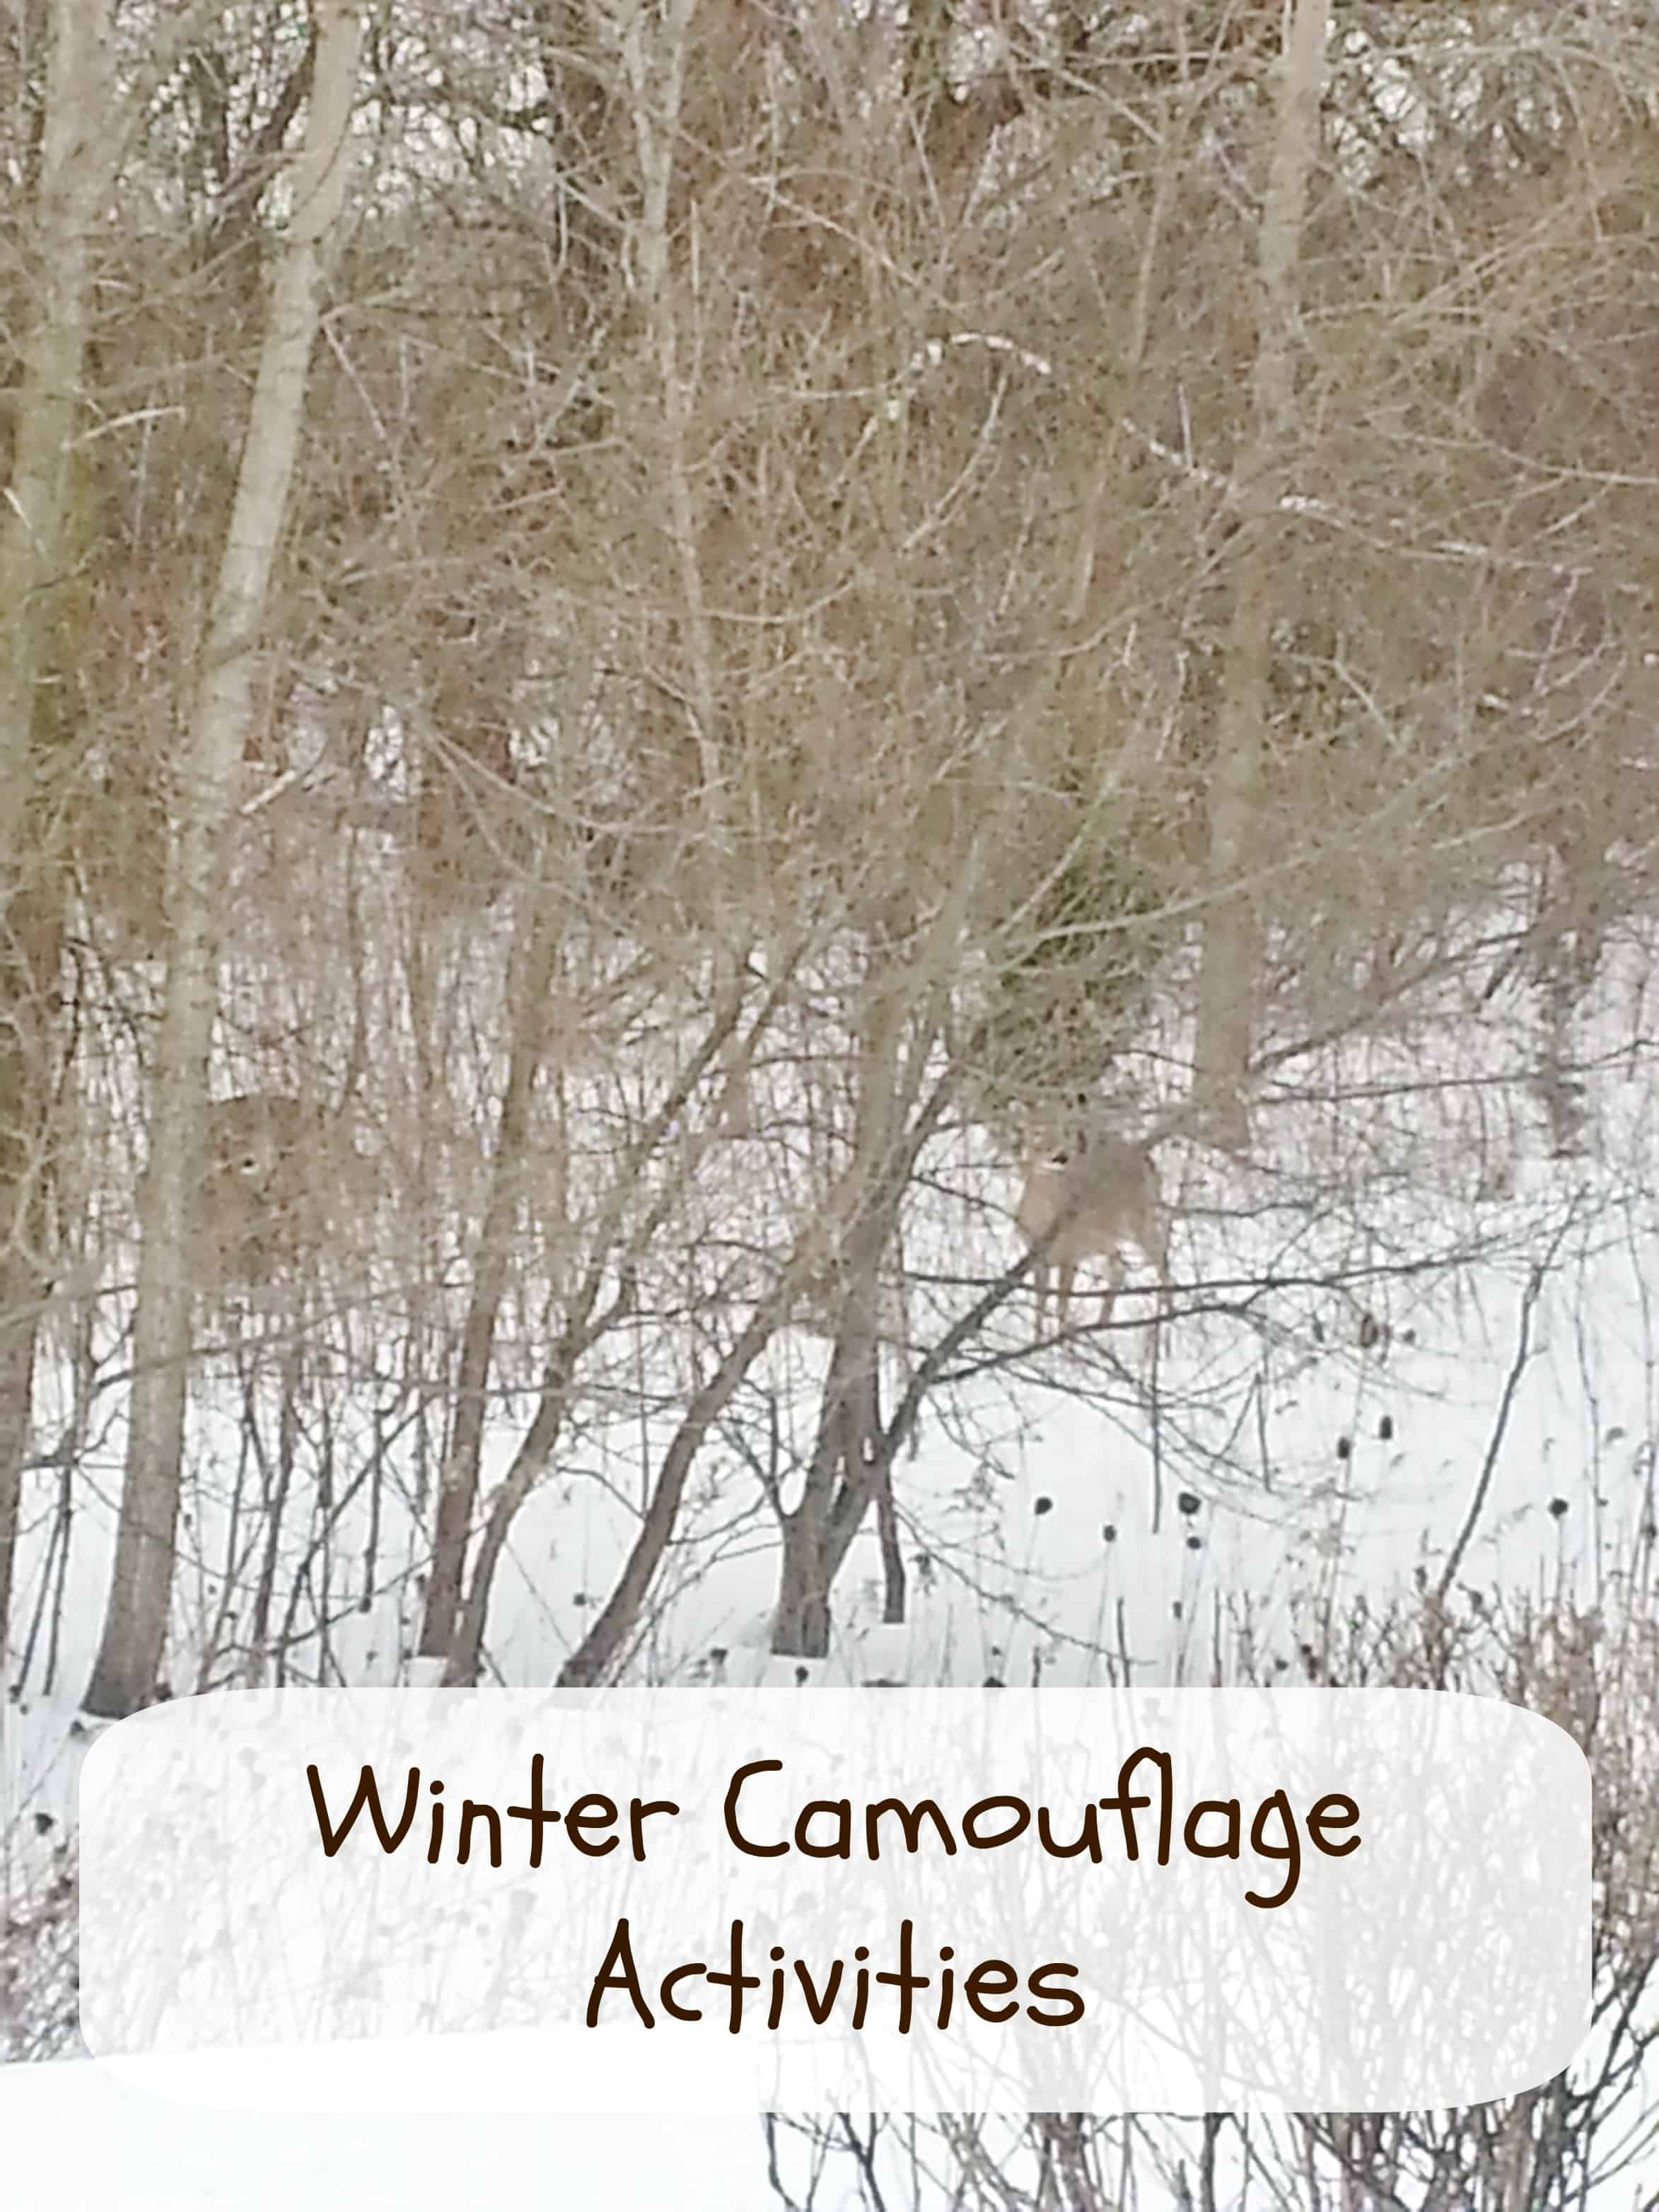 Winter Camouflage Activities For Kids